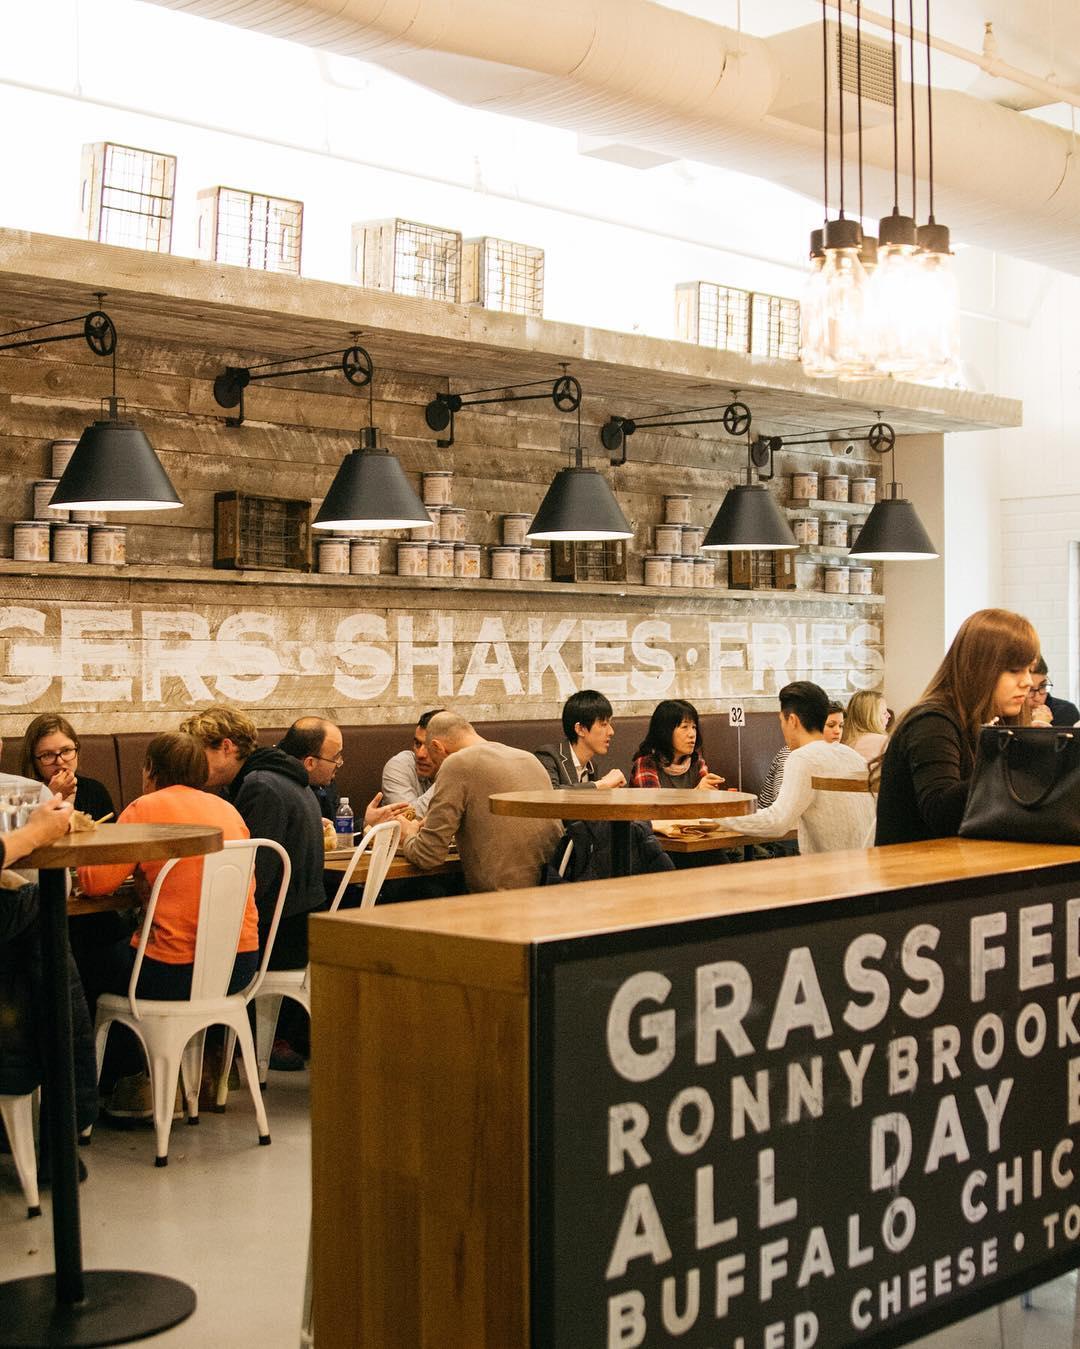 Perfectas hamburguesas y shakes en @ronnybrookfarm del Chelsea Market.  #recomendadot&l